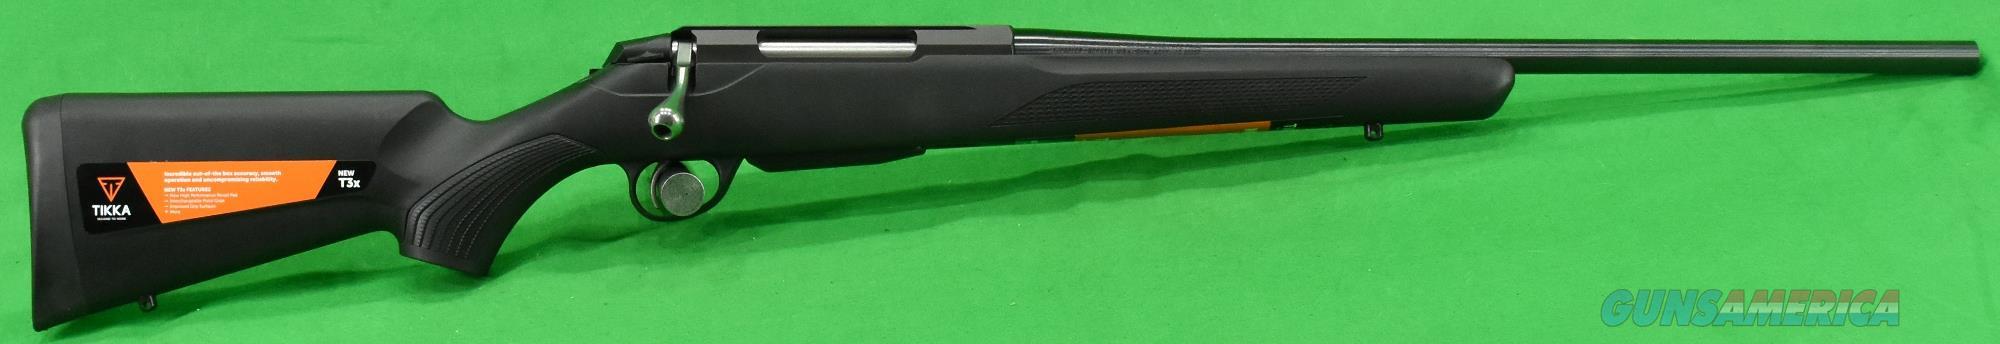 T3x Lite Compact 243Win 20In  JRTXE315C  Guns > Rifles > Tikka Rifles > T3